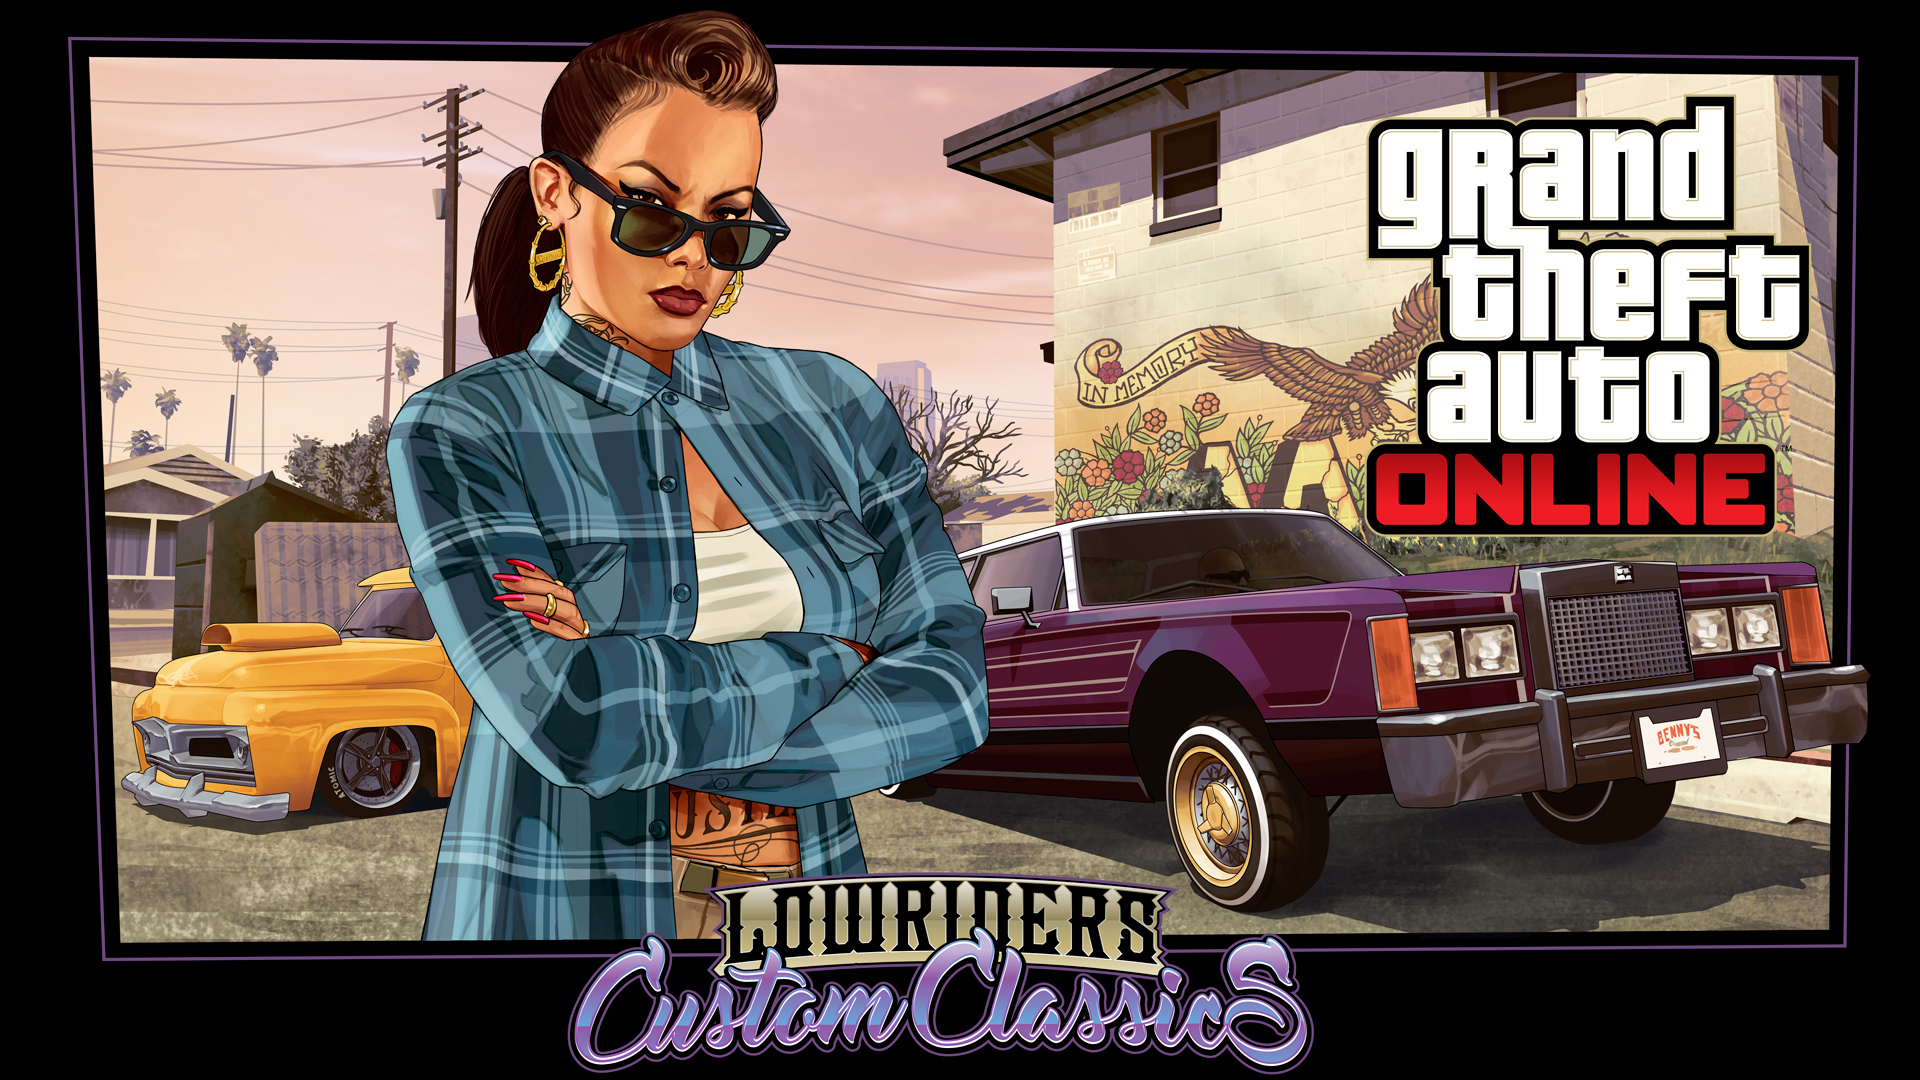 Lowriders: Custom Classics